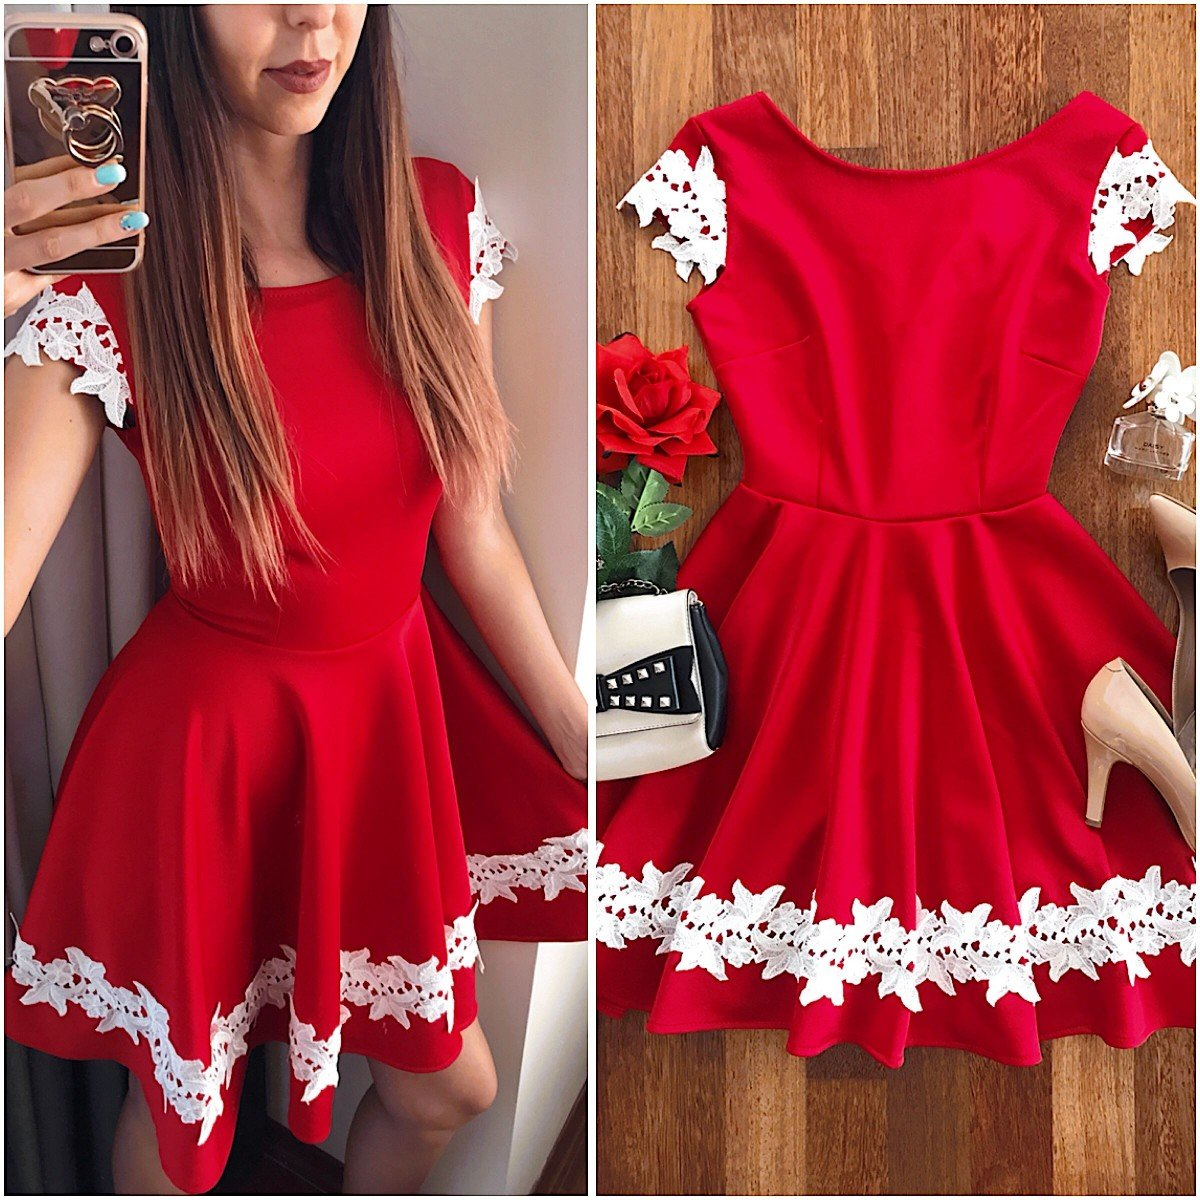 Rochie de ocazie rosie cu maneci si dantela cusuta